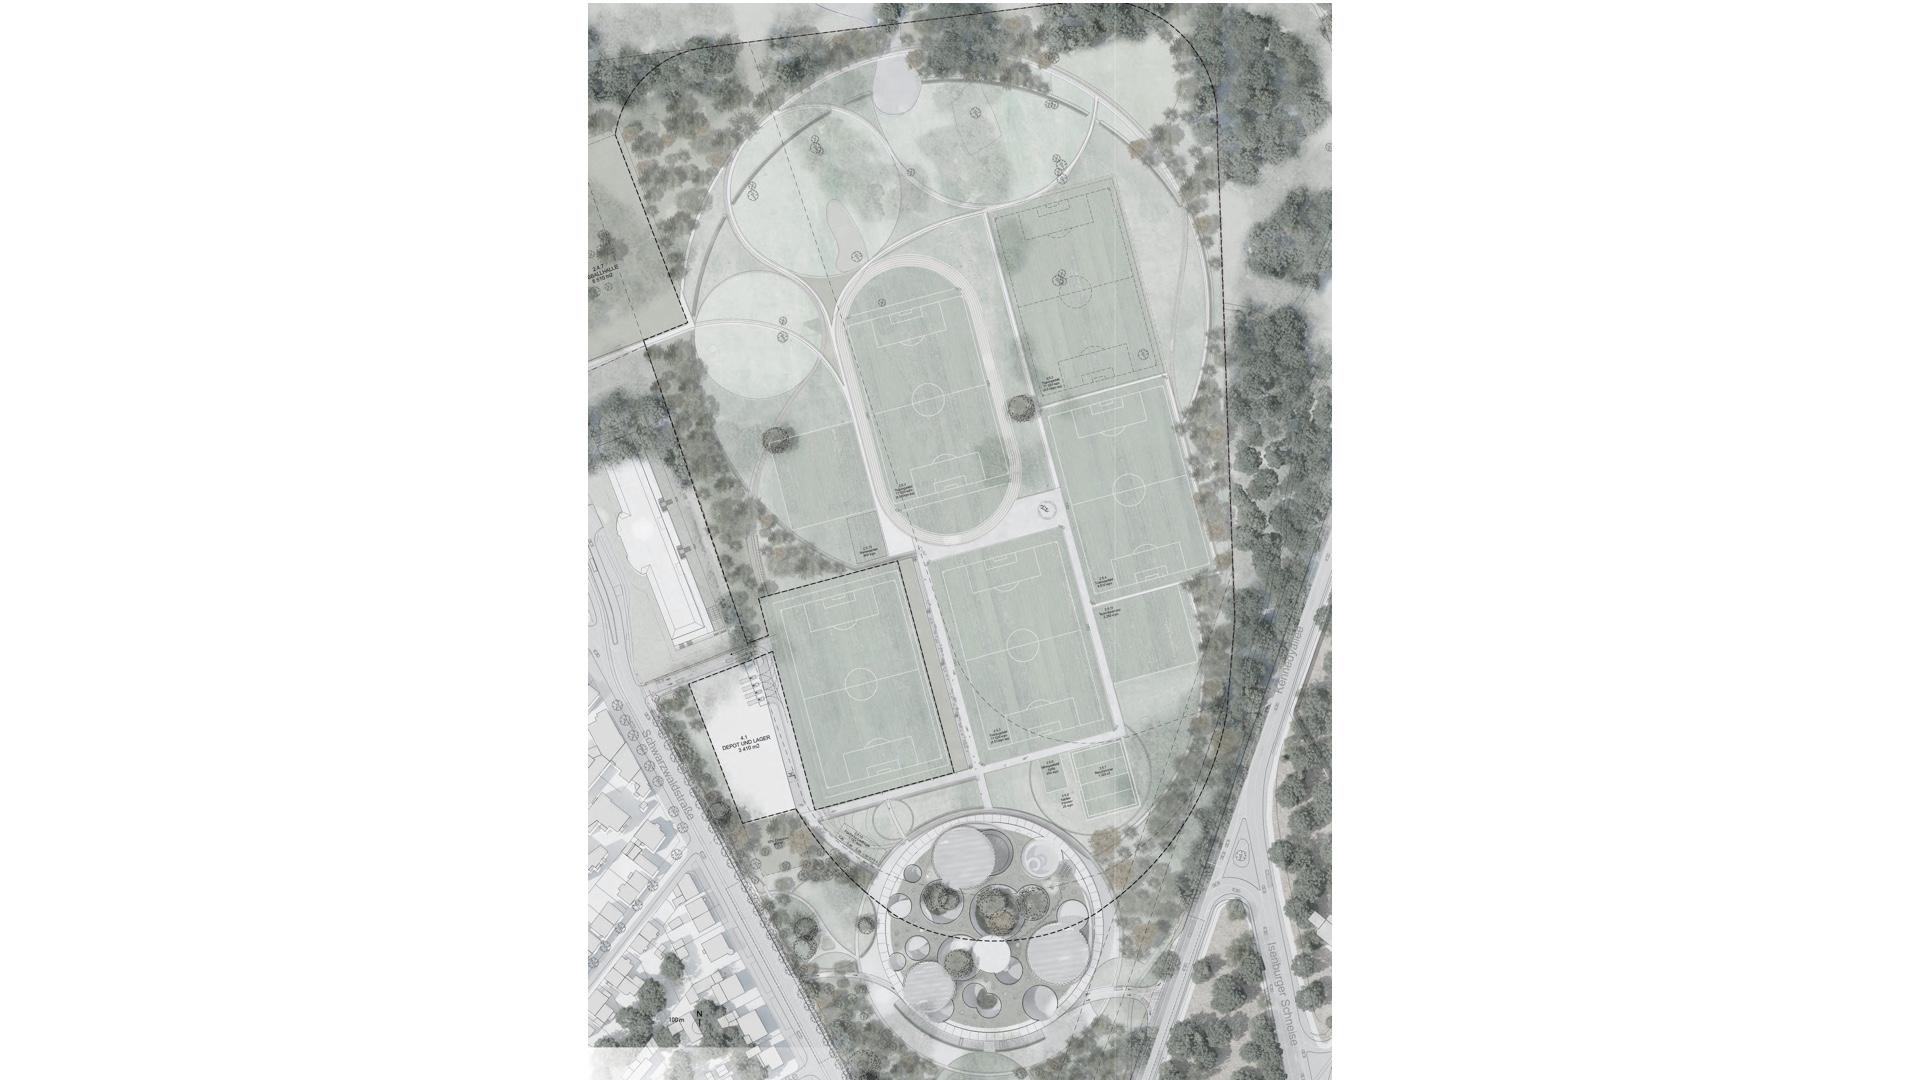 Djao-Rakitine Deutscher Fussball-Bund Academy, Frankfurt